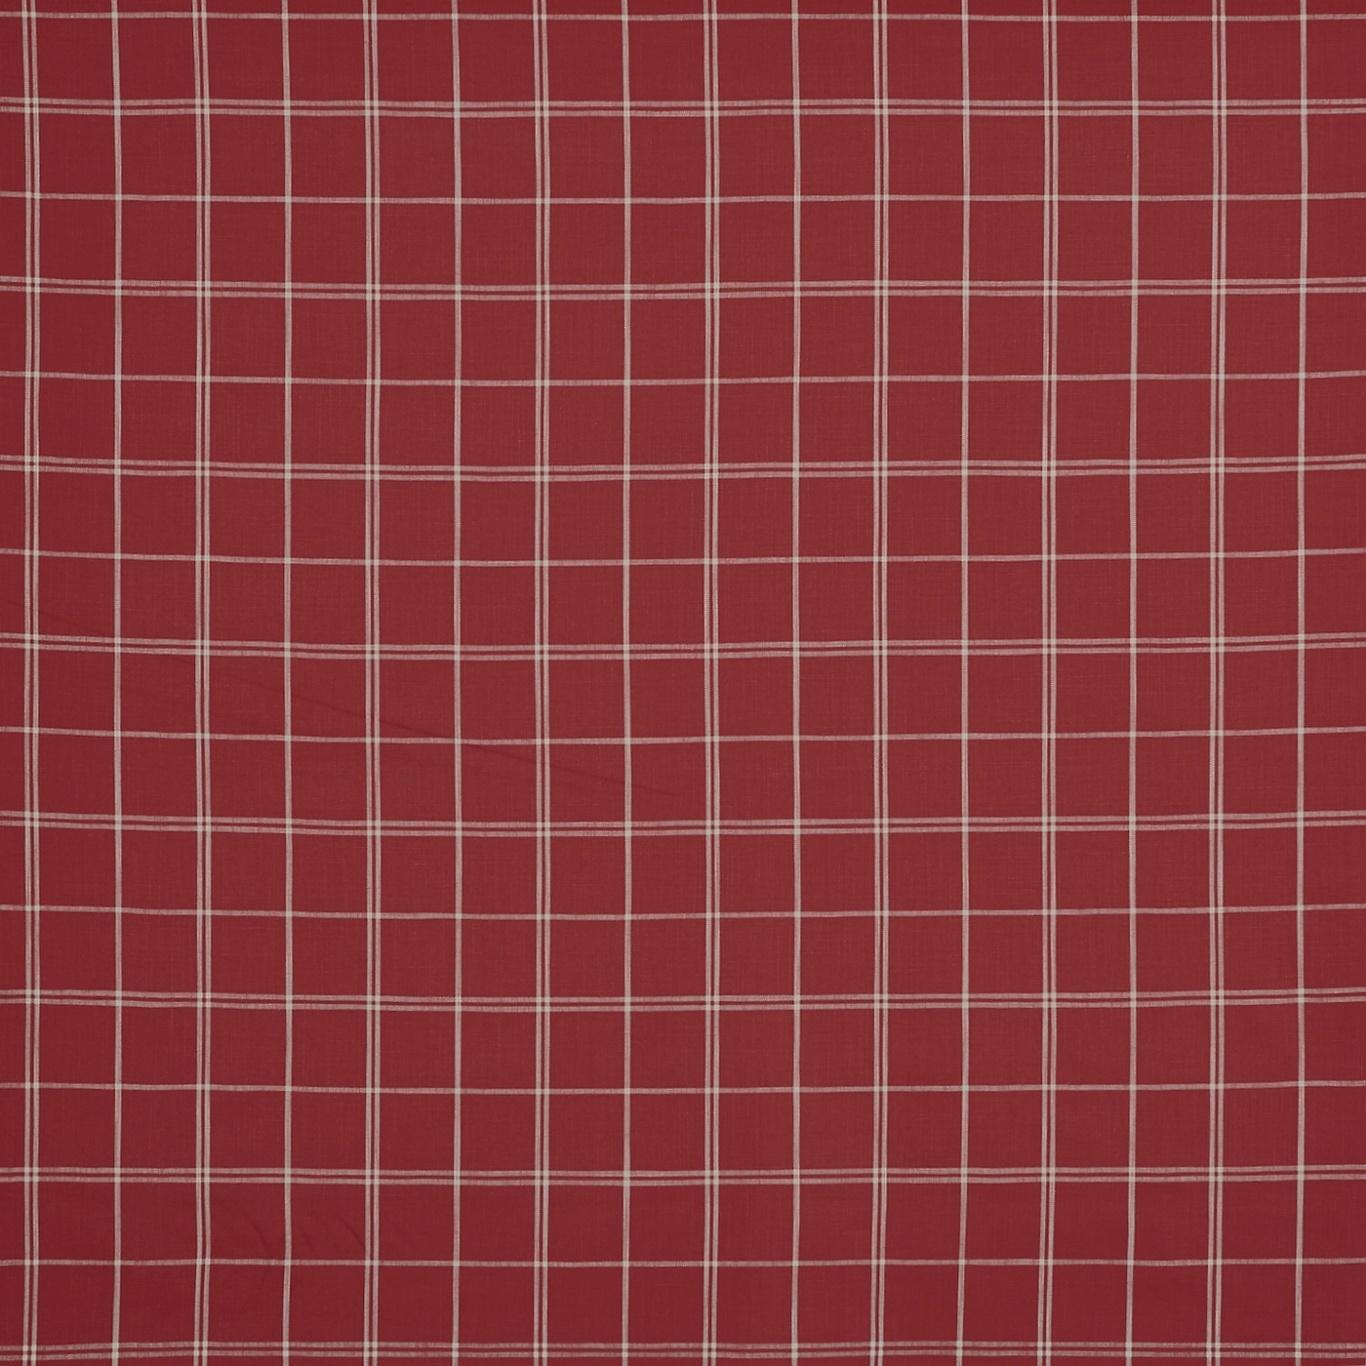 Image of Prestigious Boston Ruby Fabric 3814/302